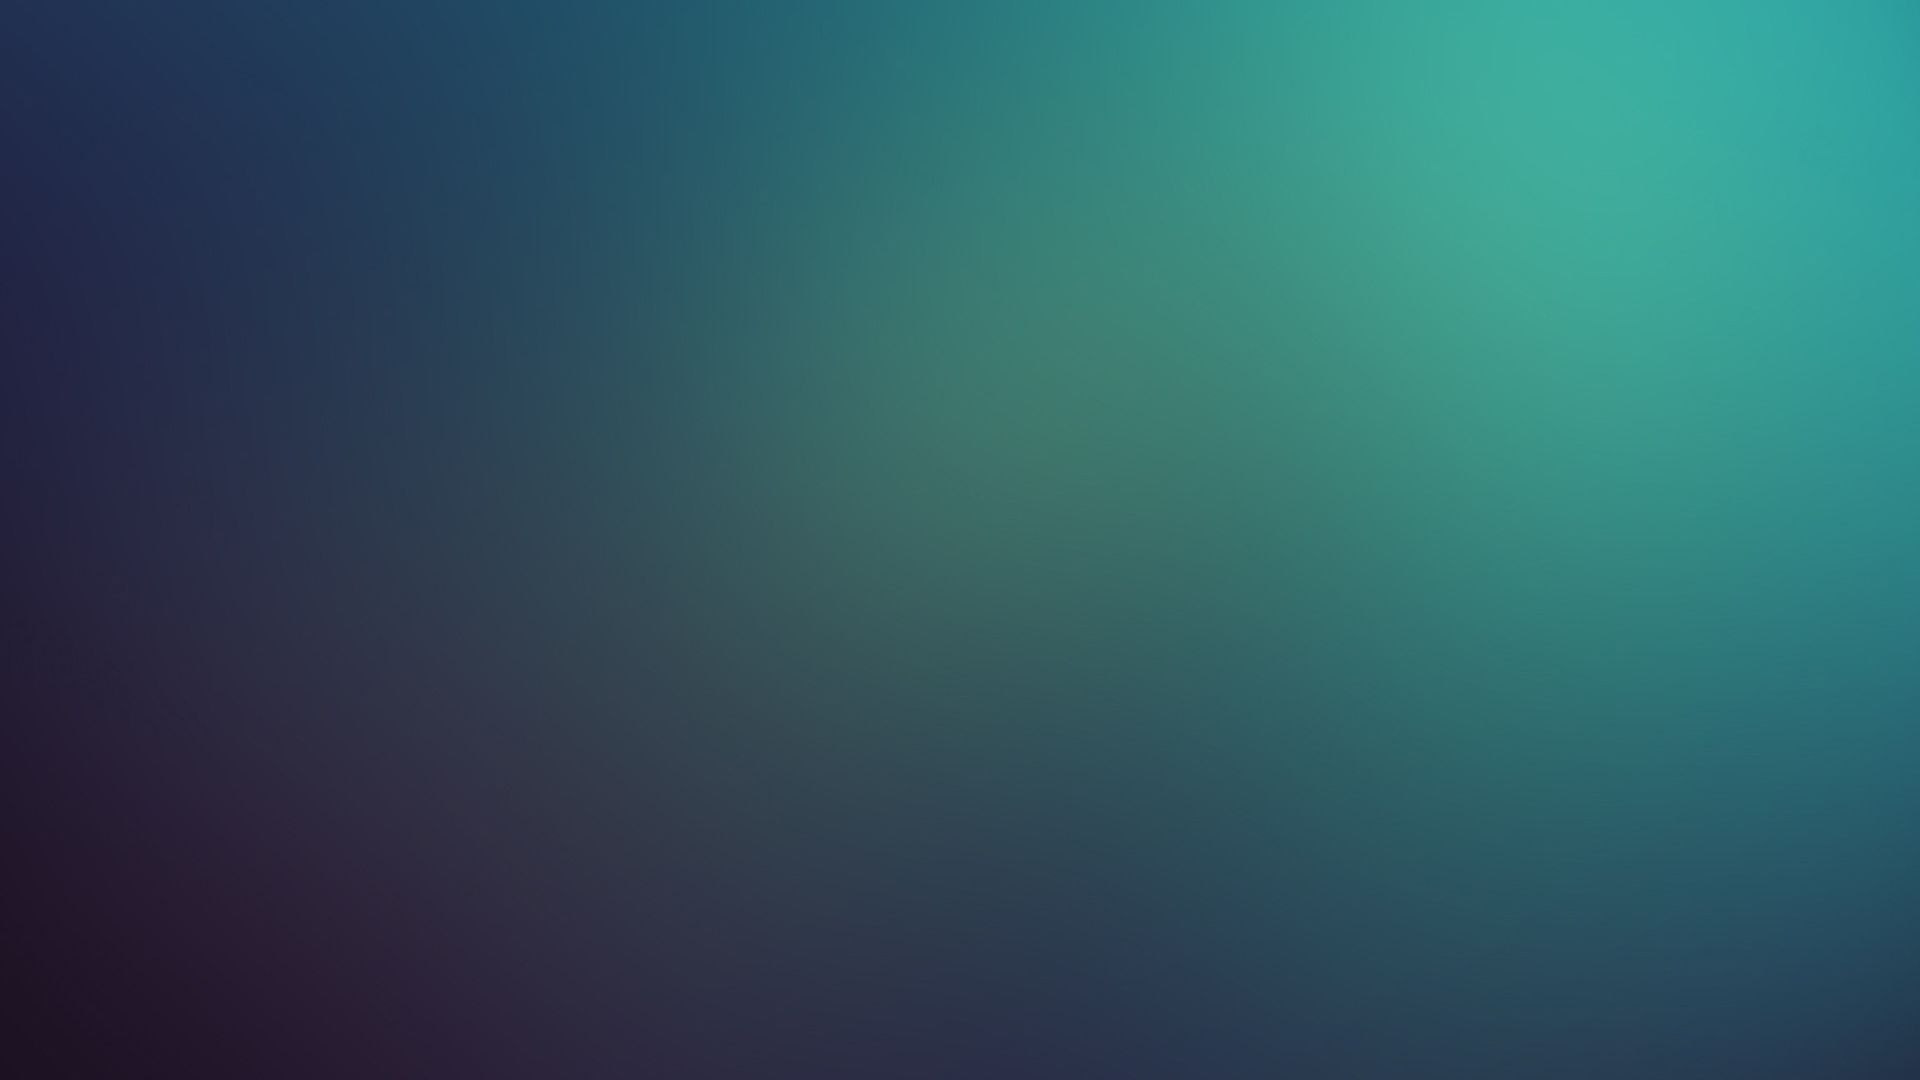 Abstract-Gradient-48_www.FullHDWpp.com_.jpg